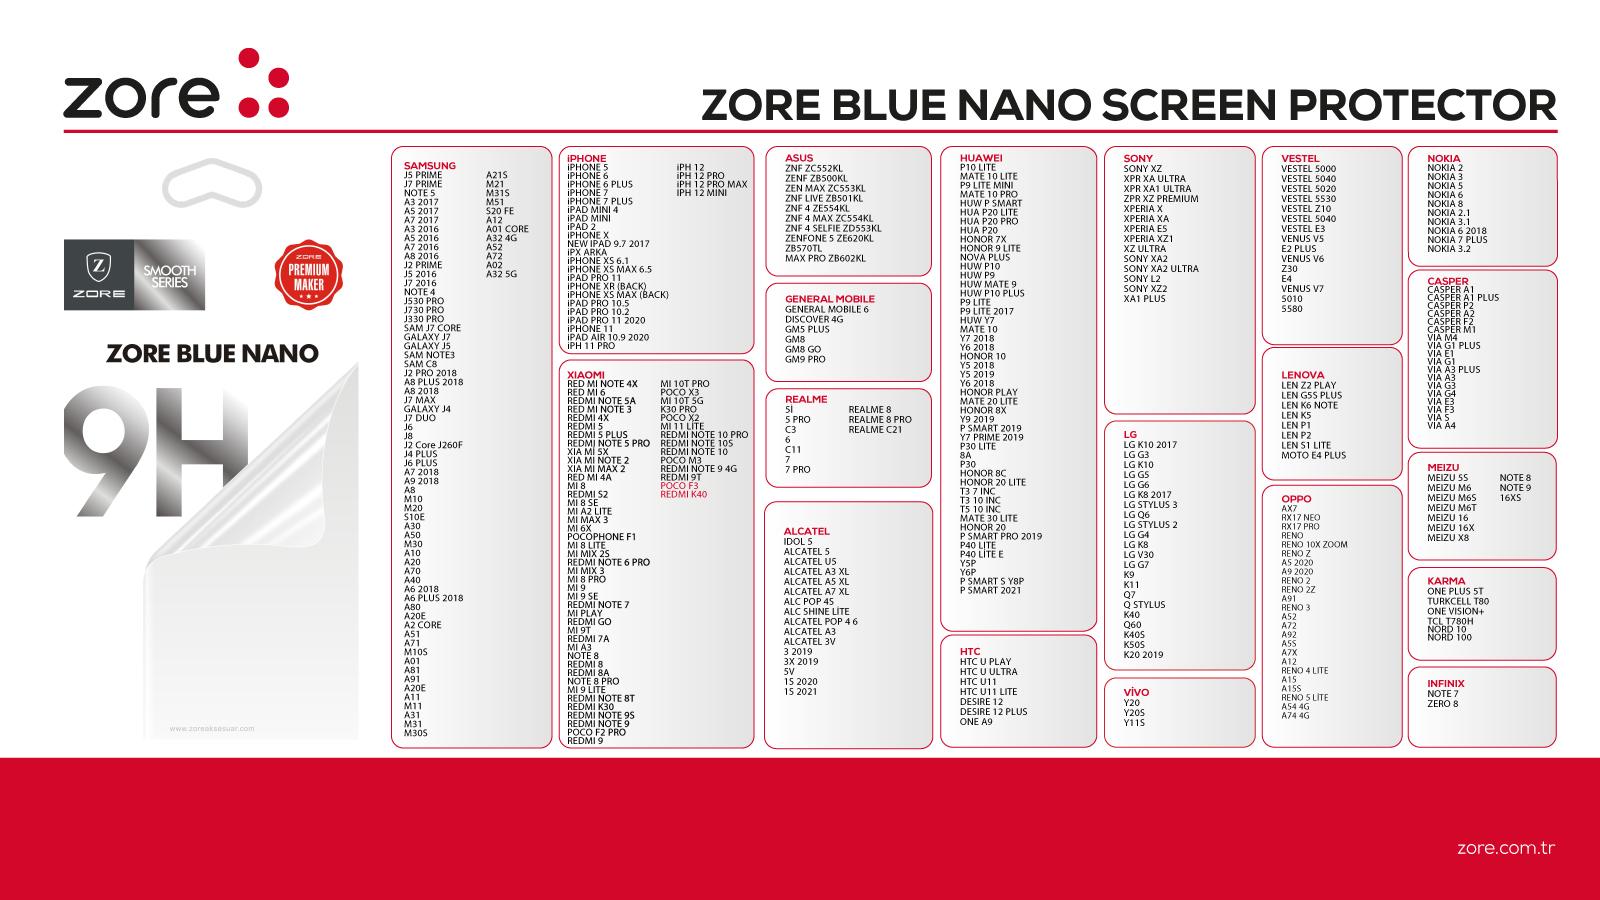 ZORE BLUE NANO SCREEN POTECTOR.jpg (556 KB)